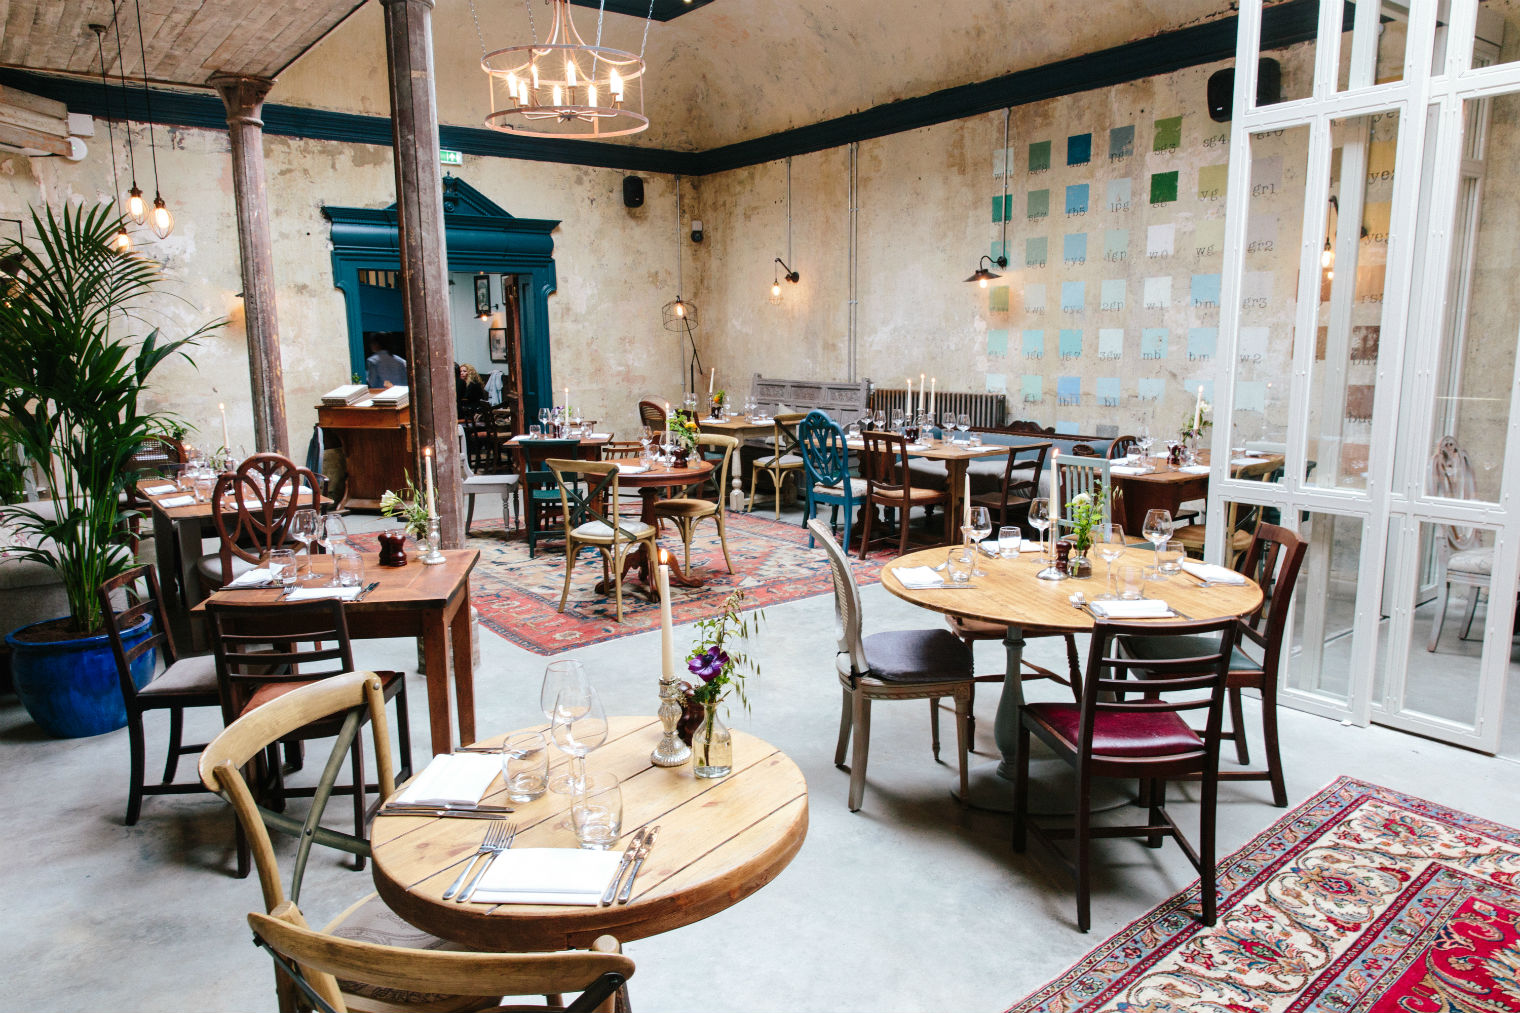 The dining room. Photo: PR